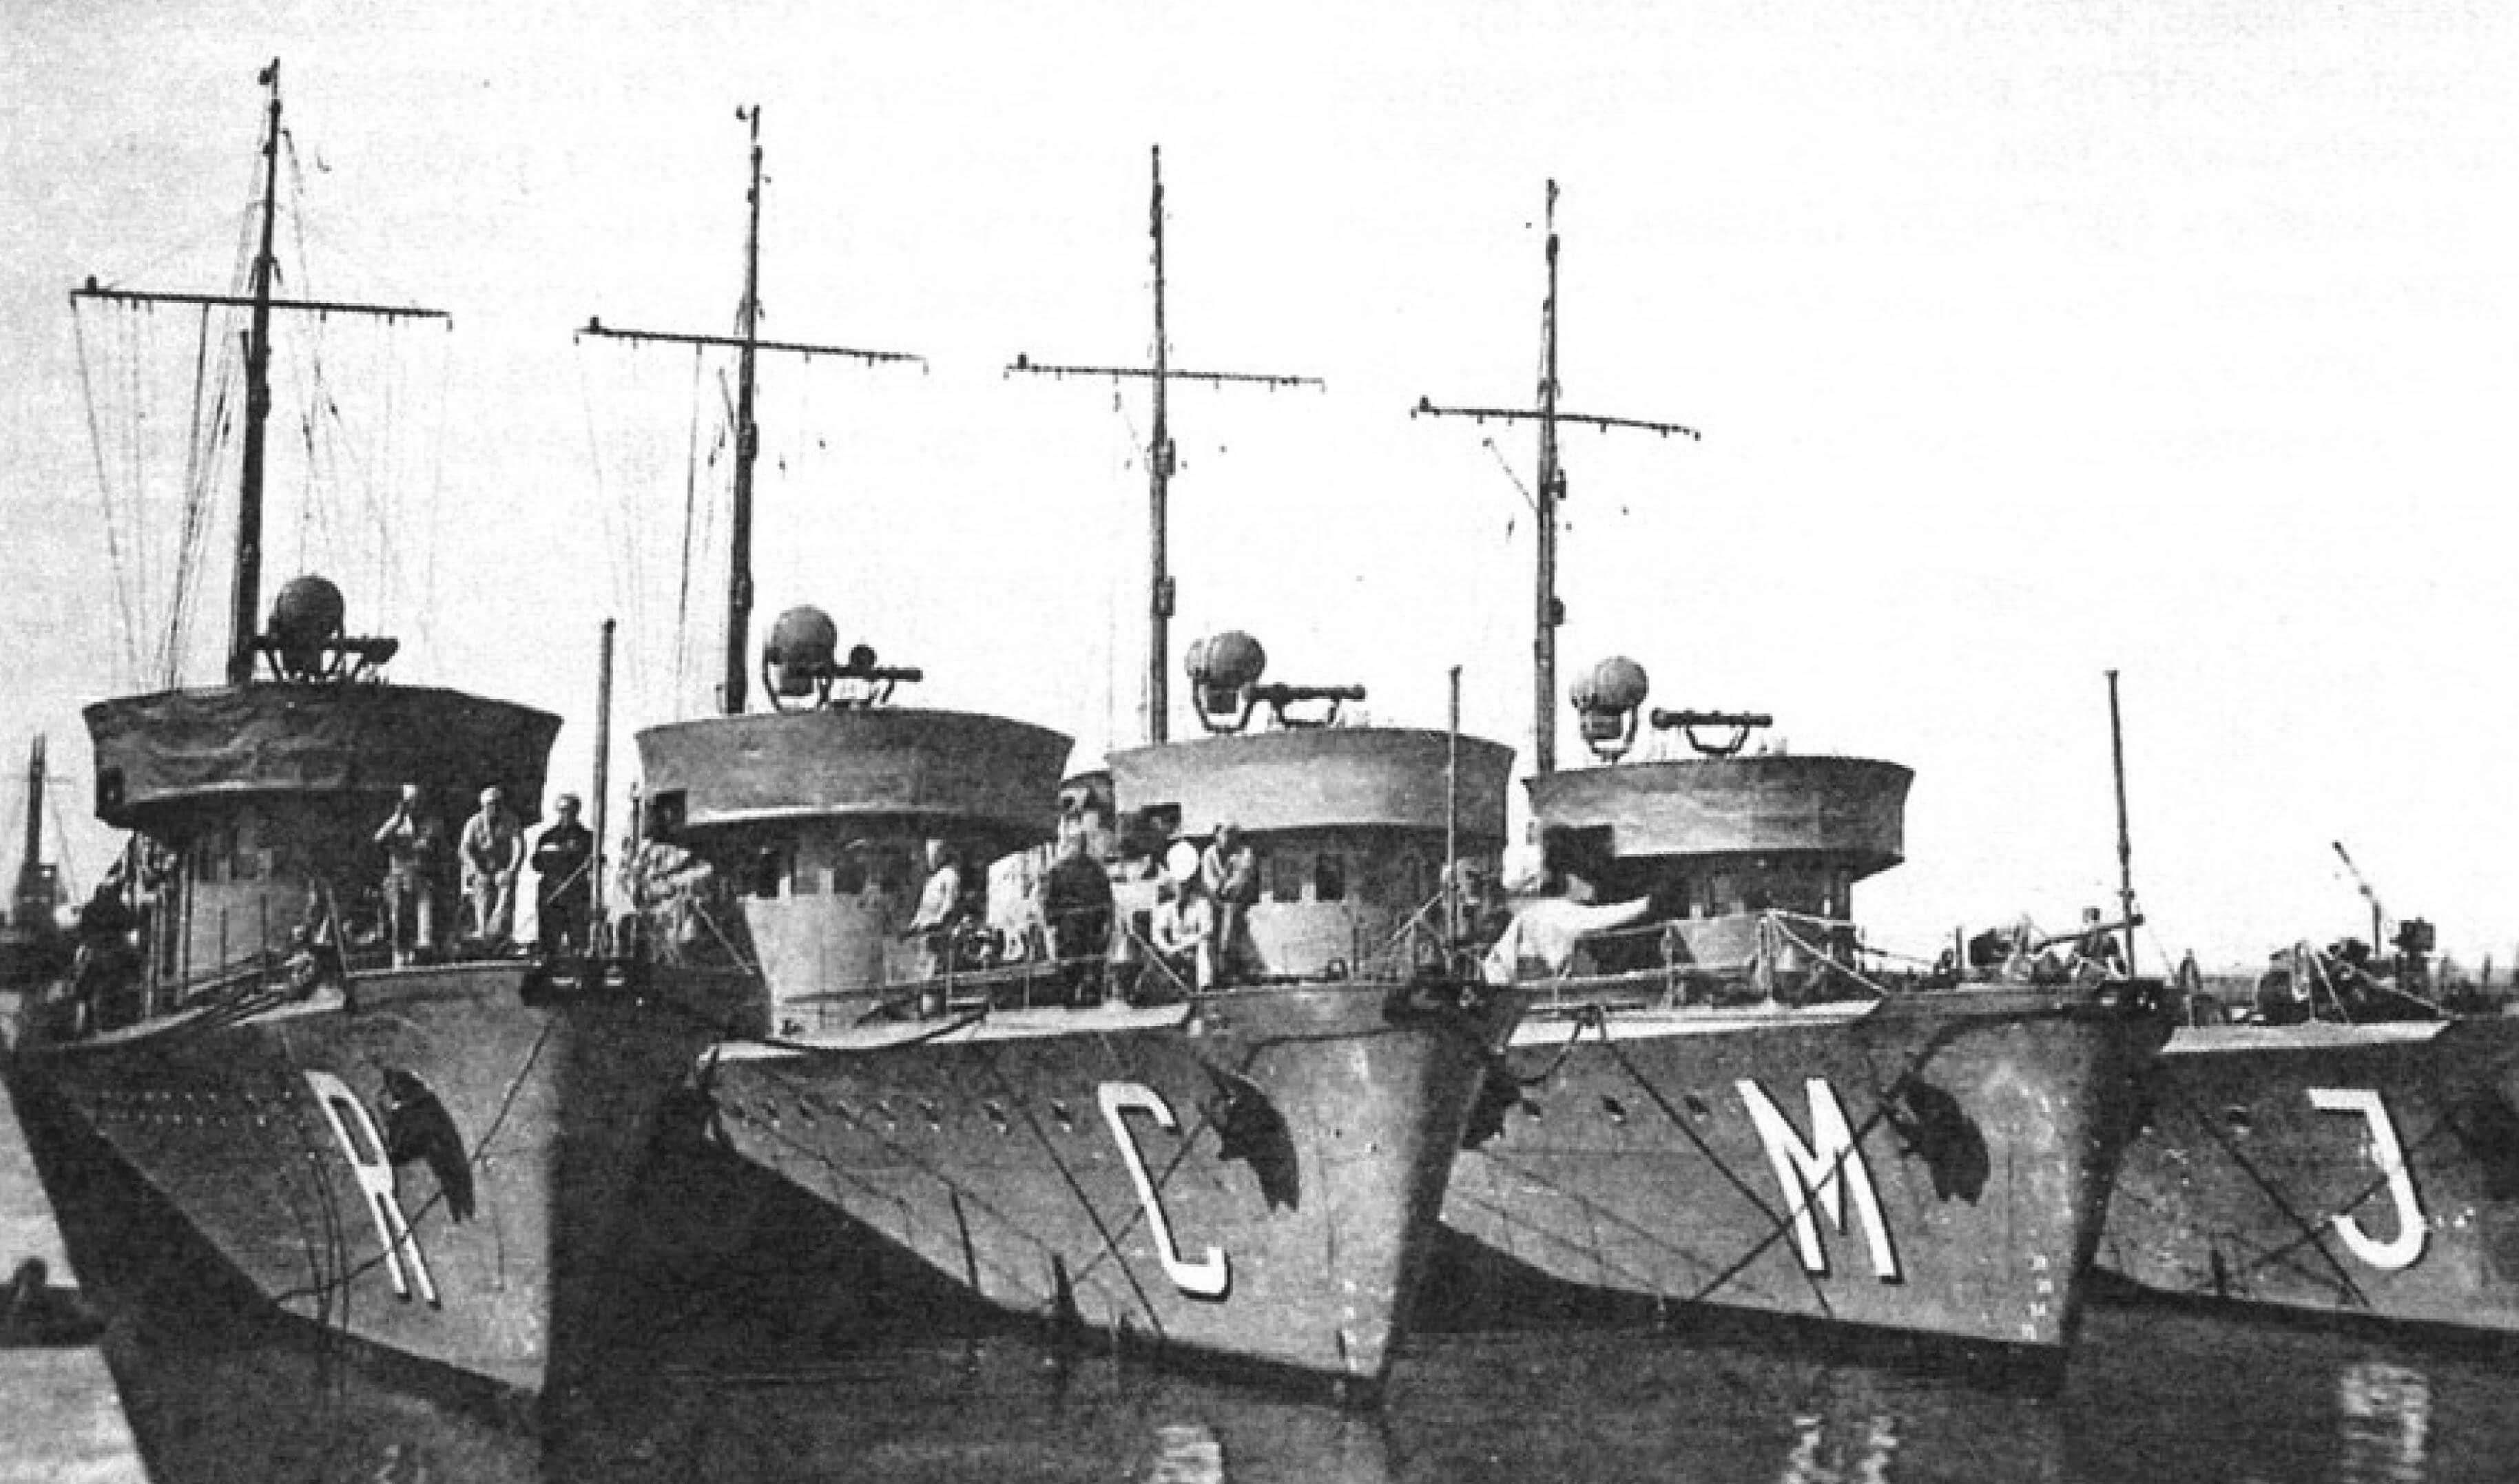 Тральщики «Rubitwa», «Czajka», «Mewa» и «Jaskolka», фото начала 1939 года